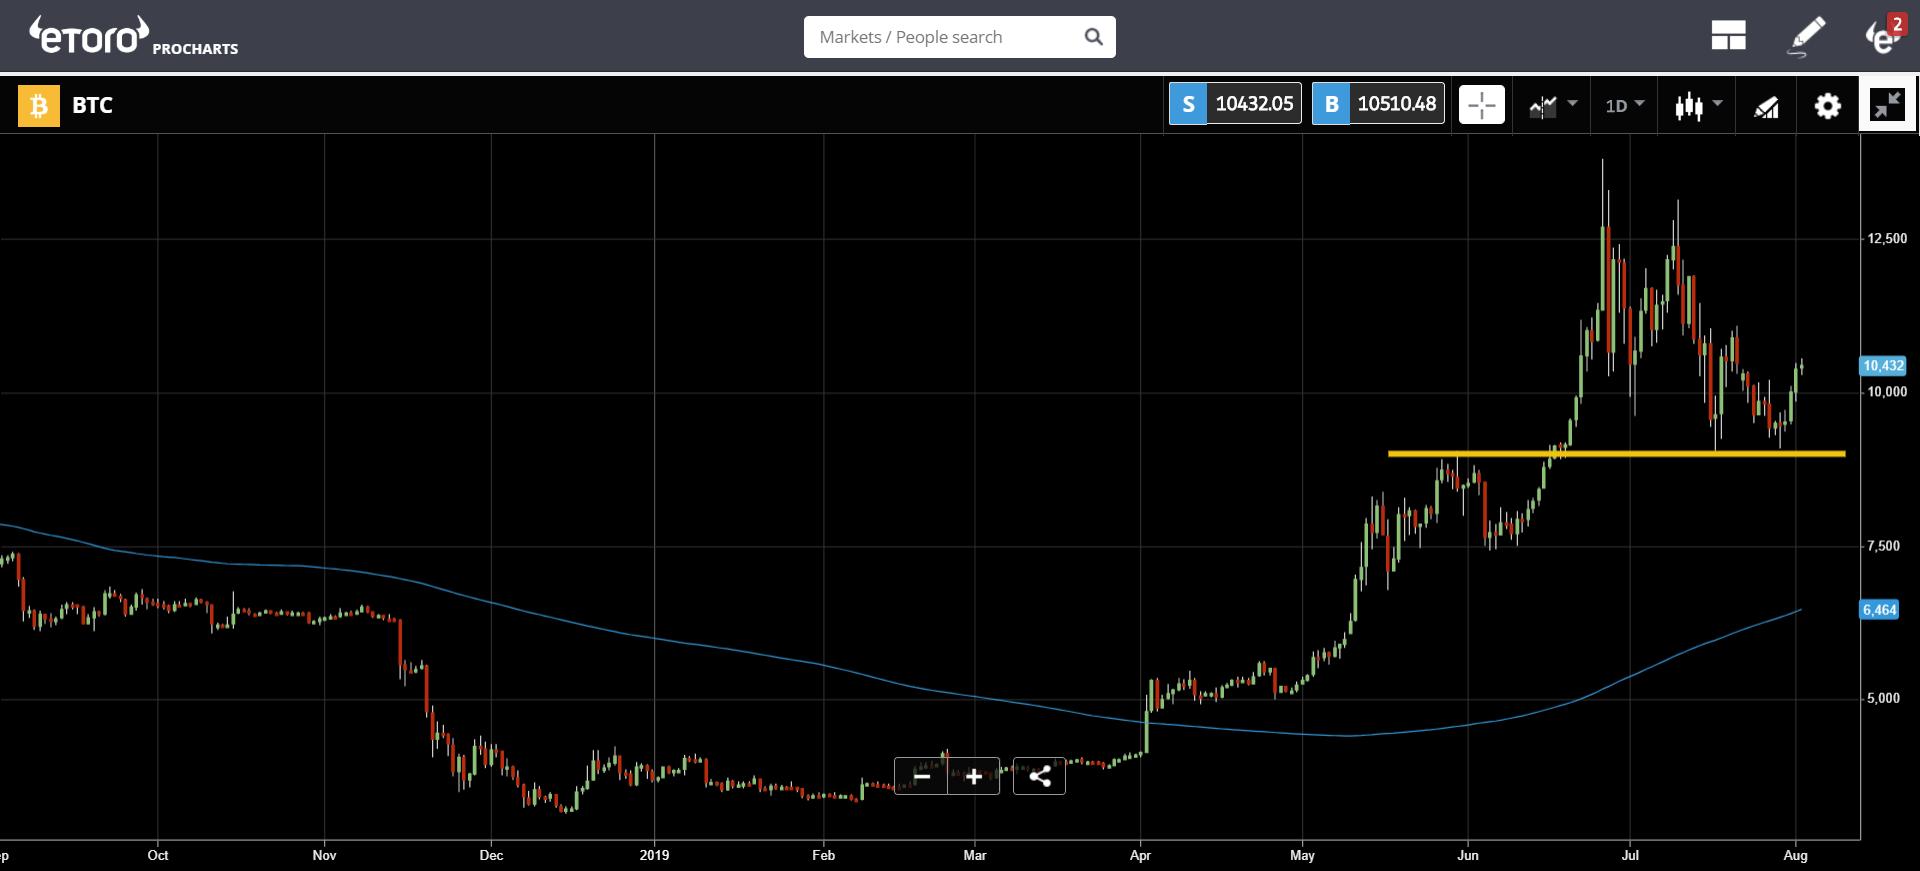 pascal, gold, trading, bitcoin, blockchain, ethereum, crypto, market, fed